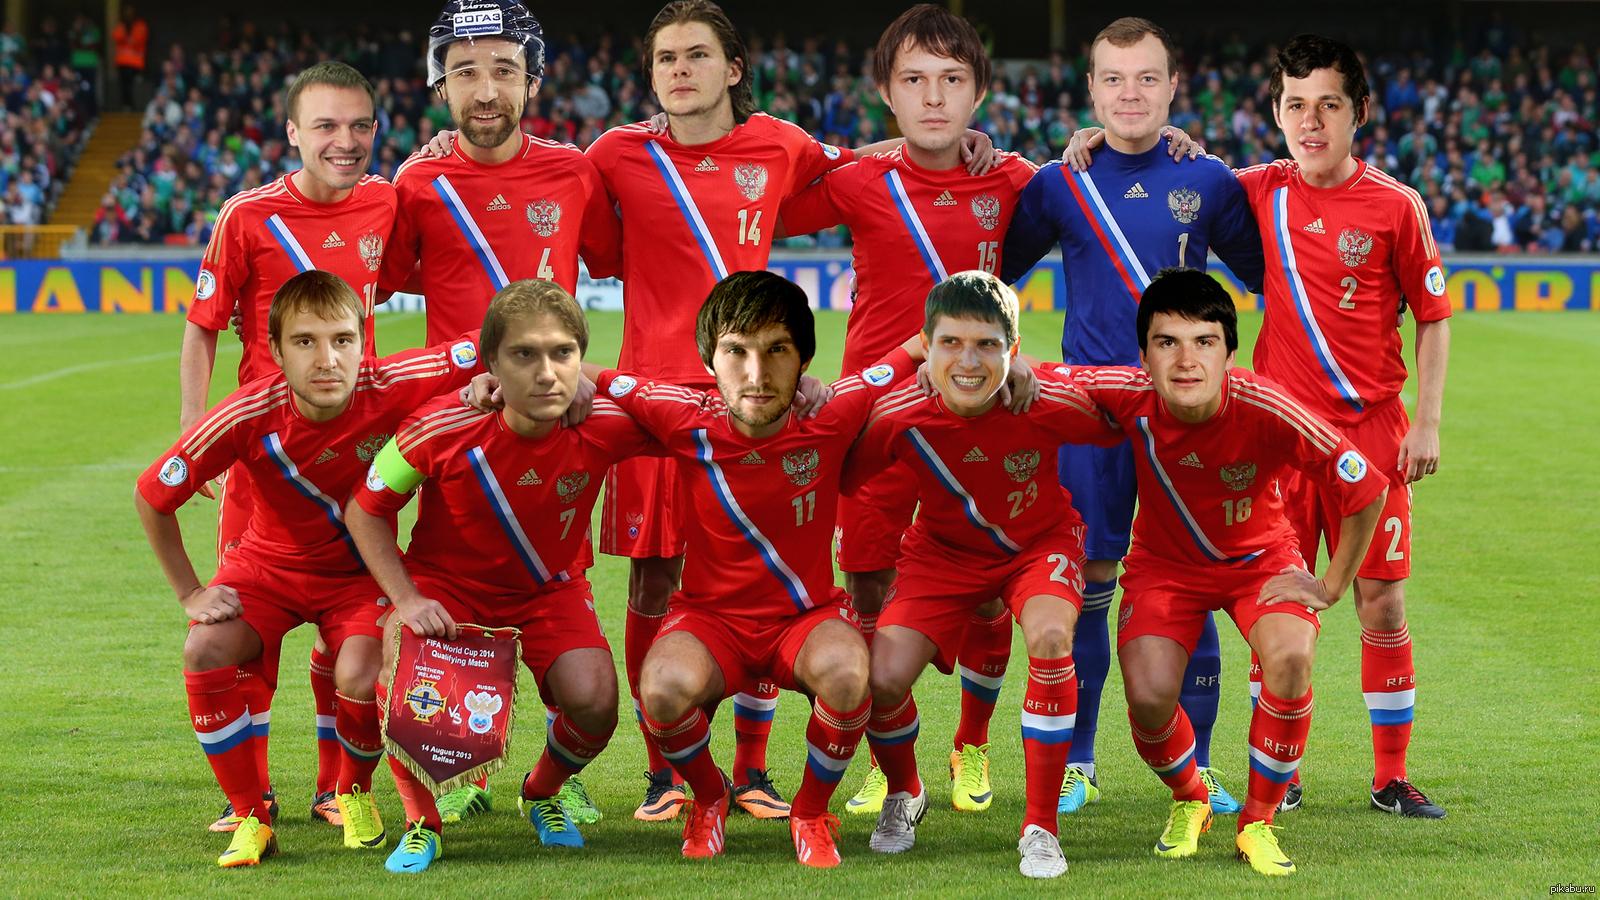 картинки про нашу сборную по футболу предлагаю вашему